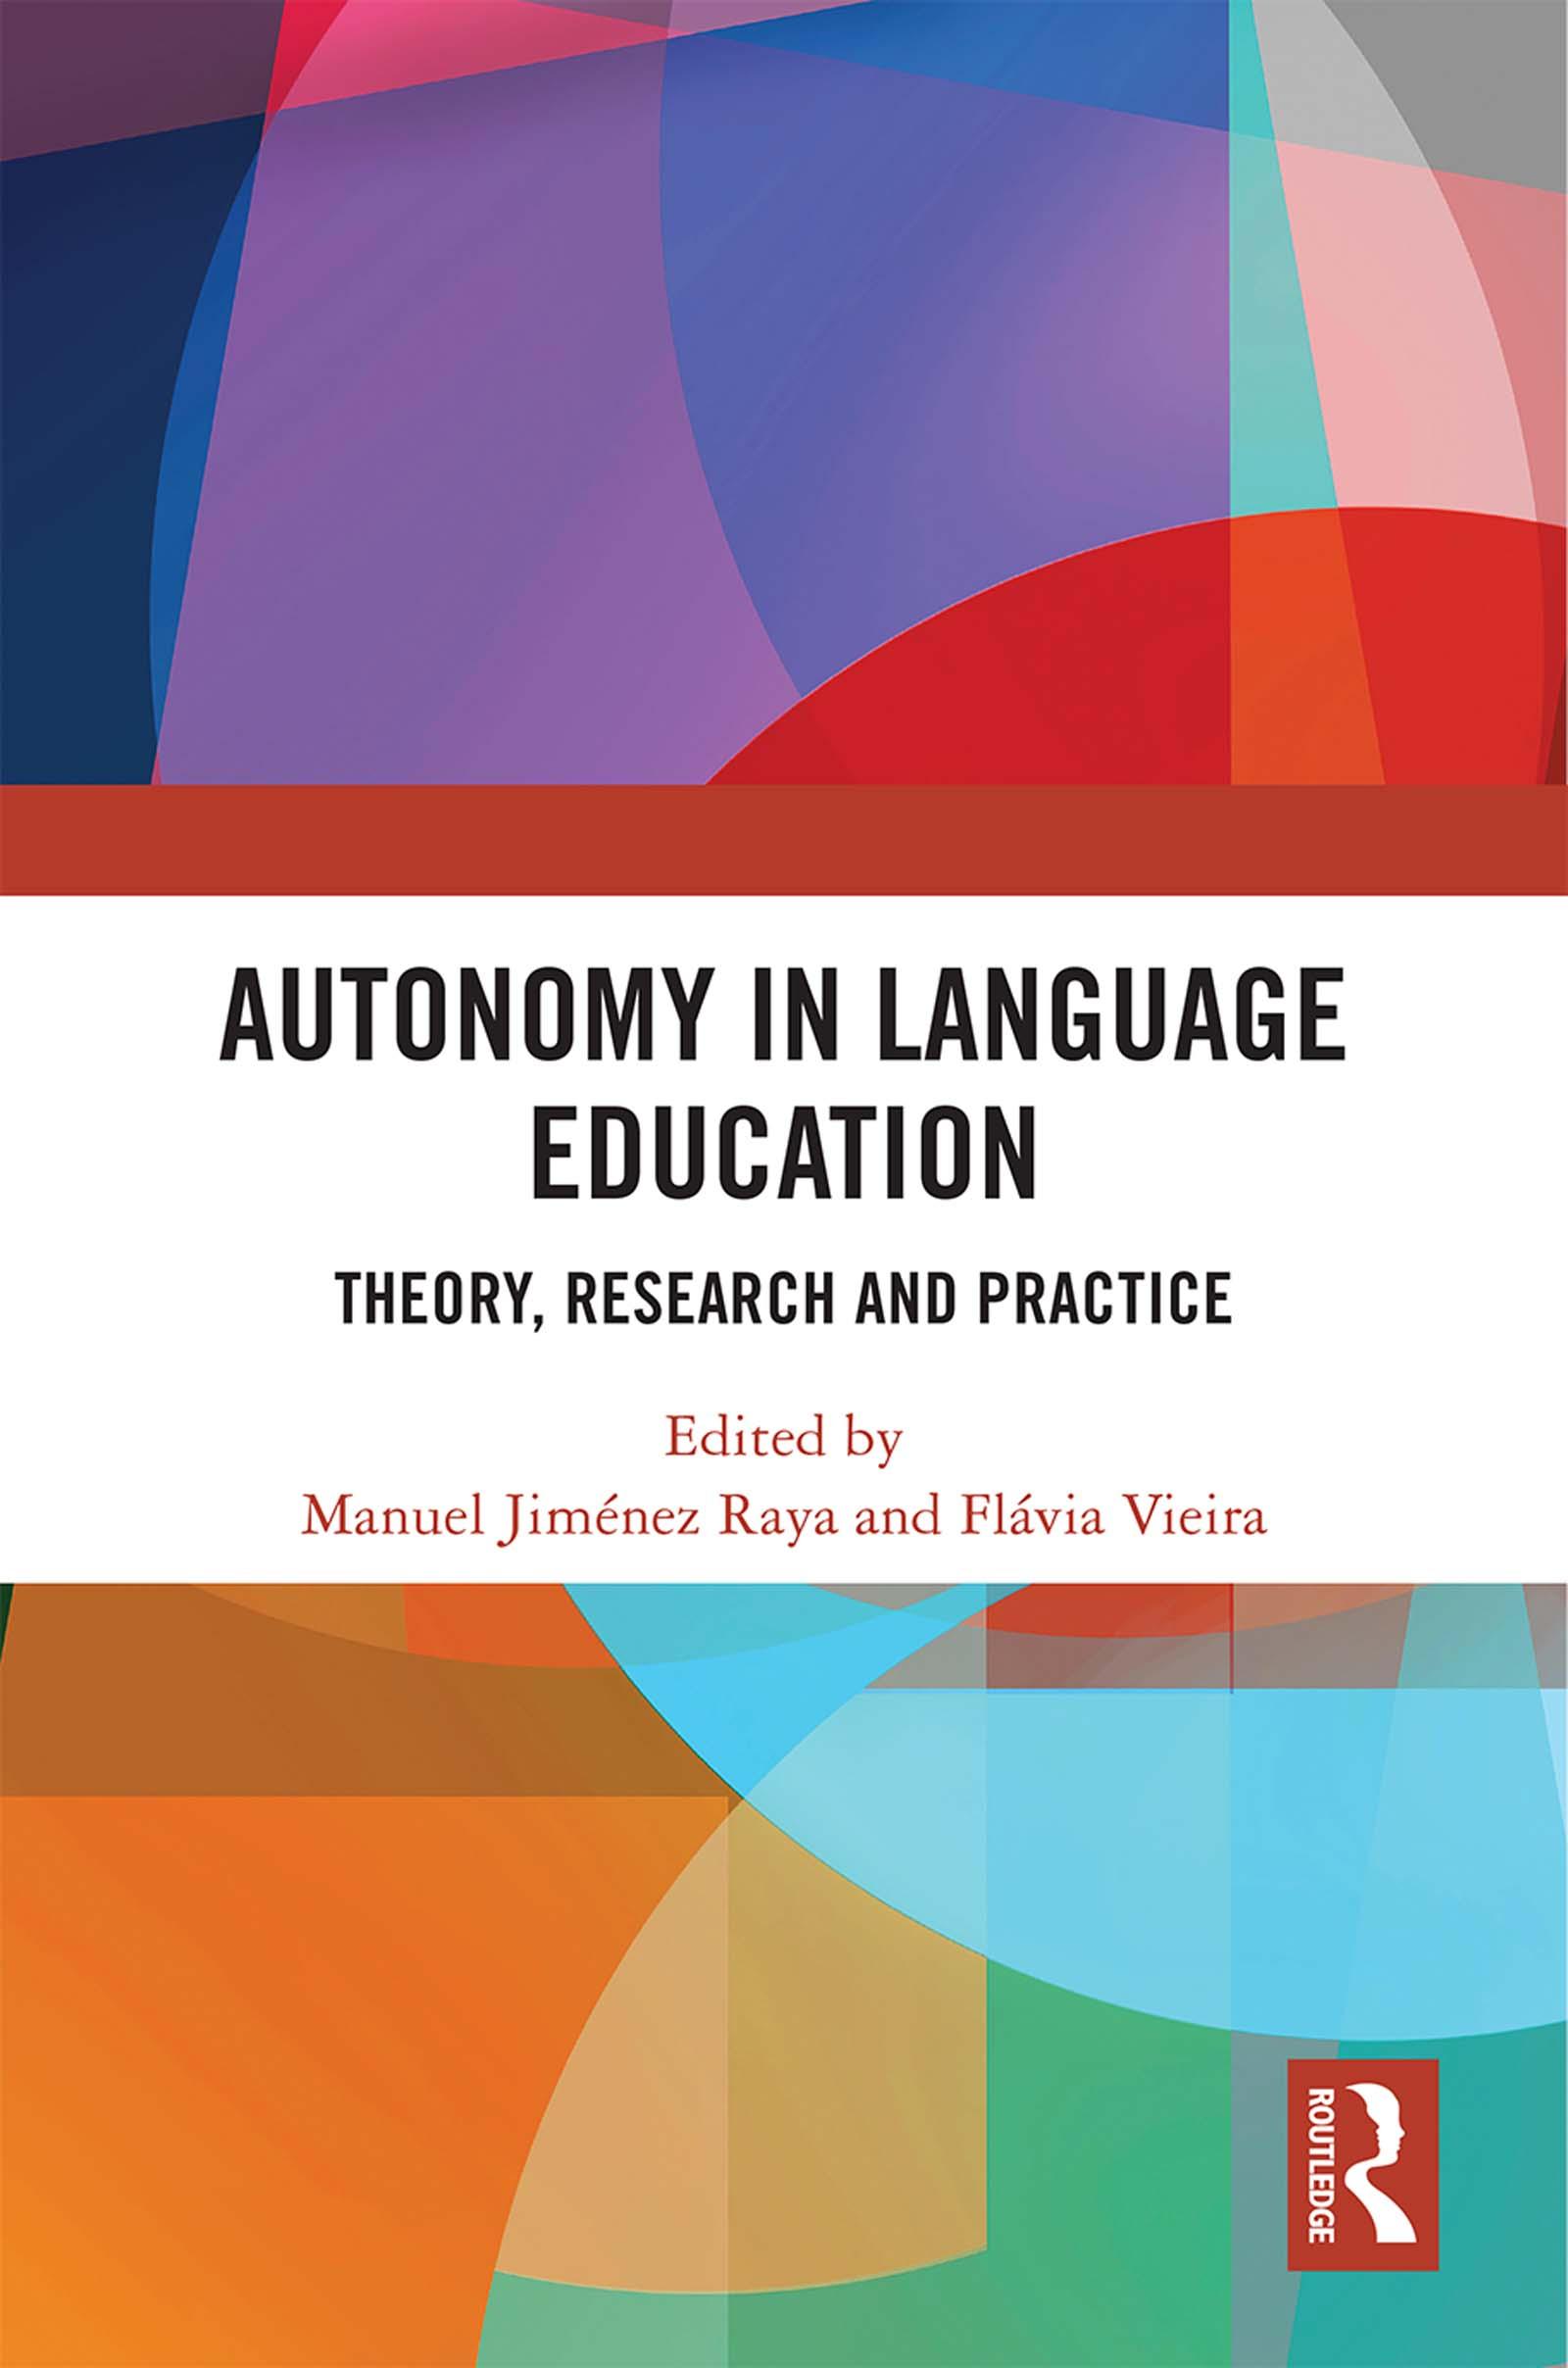 Autonomy in Language Education